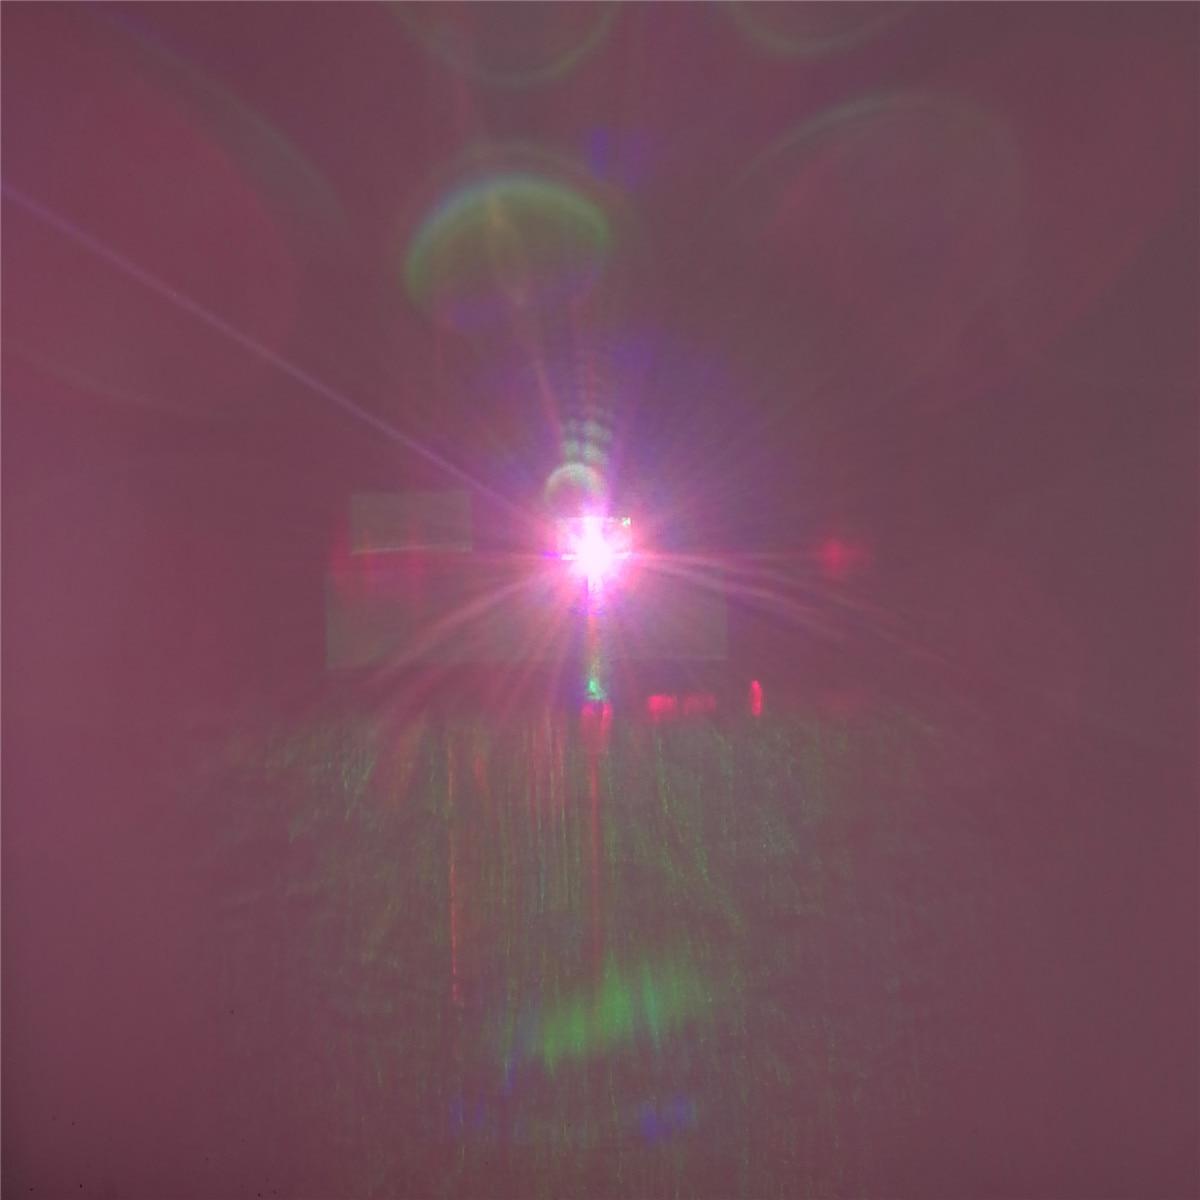 RGB 3000mW 3w White Laser Module Analog Full color Laser Module for Stage Lighting DJ KTV